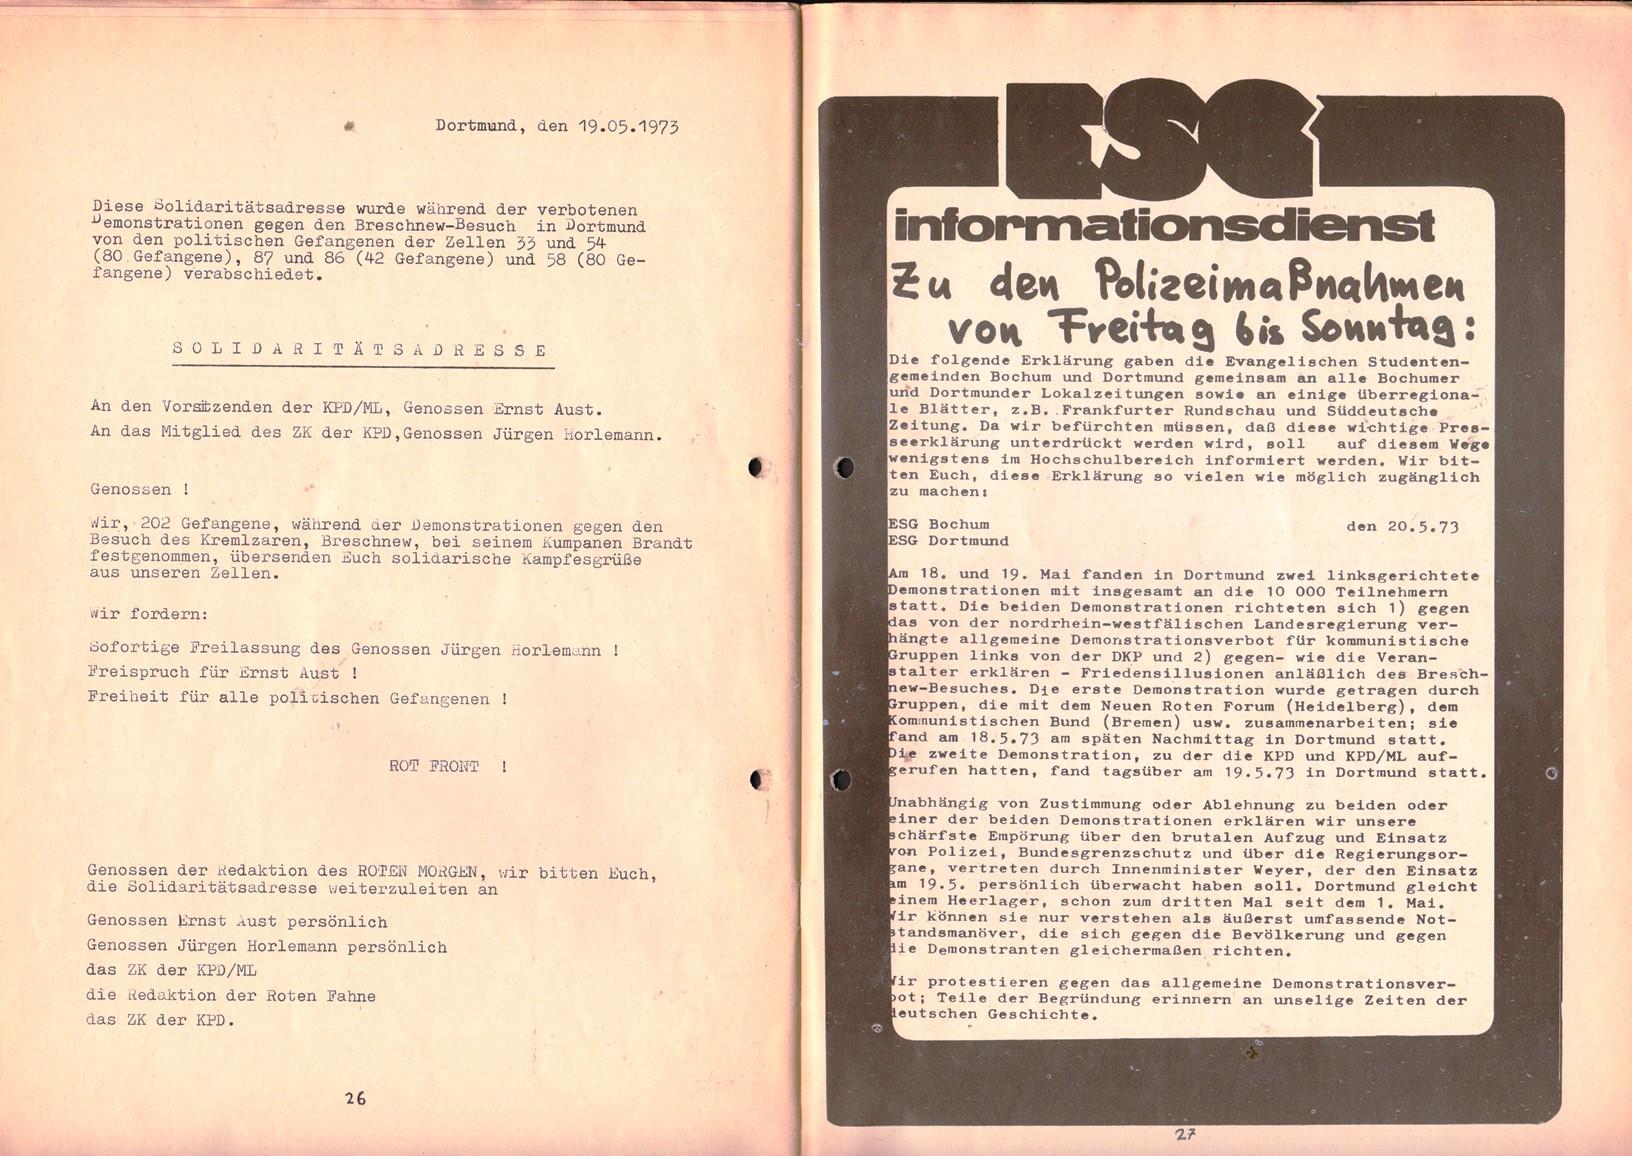 KPDML_1973_Breschnew_Besuch_in_Bonn_14